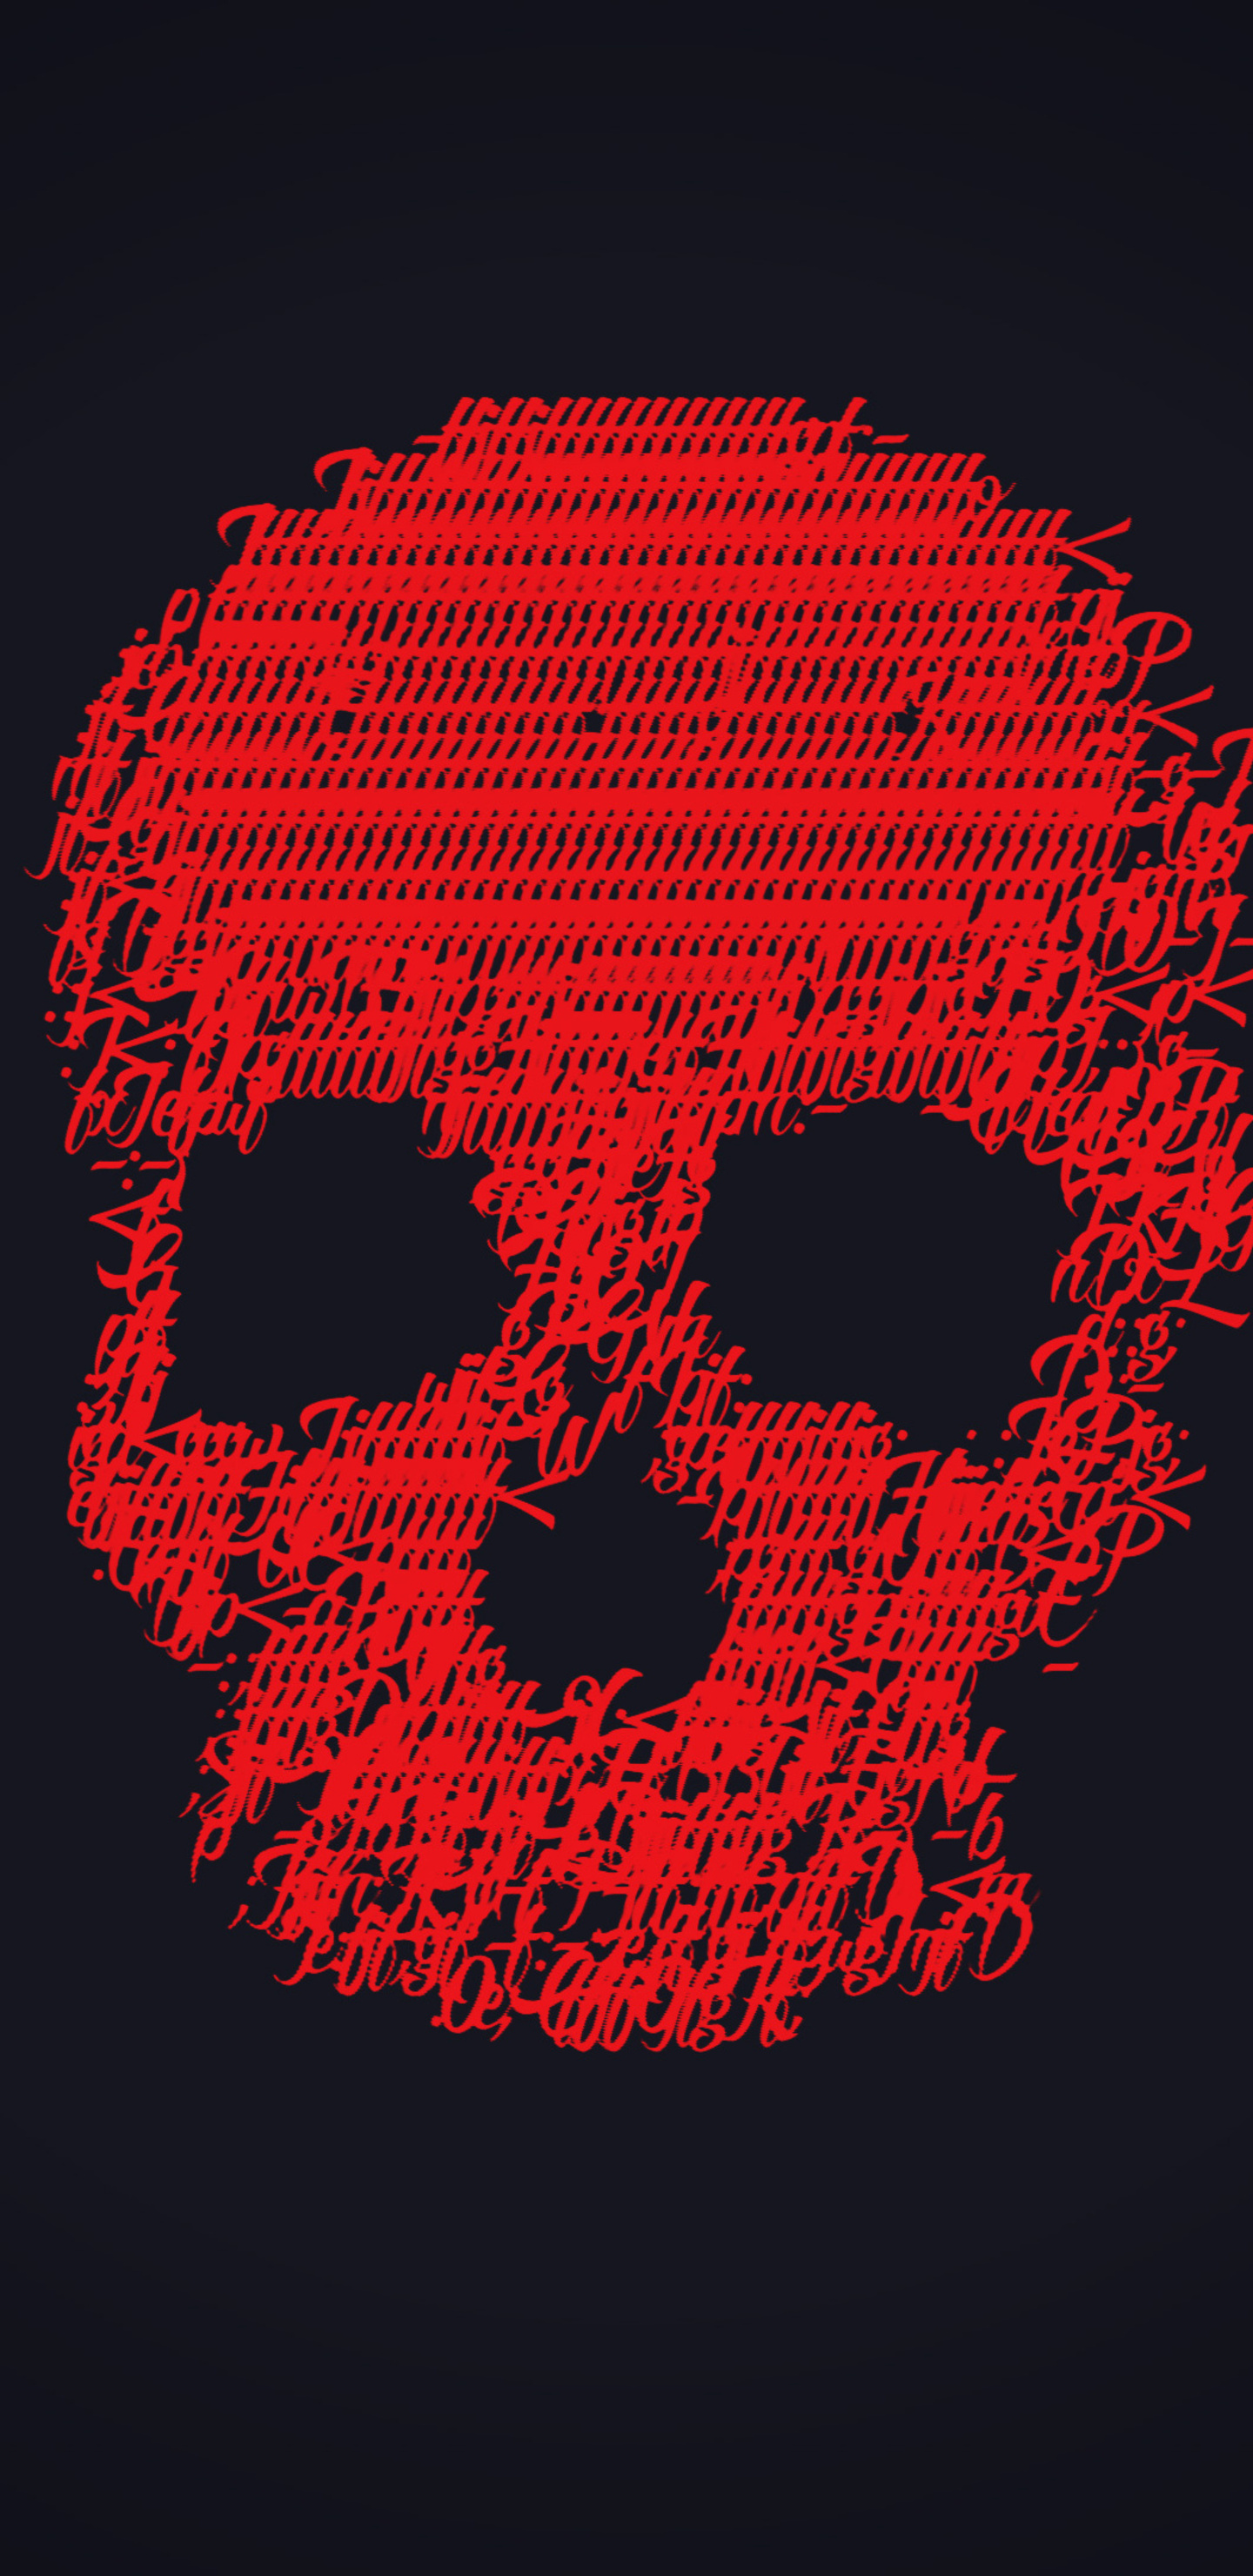 1440x2960 Red Skull 4k Samsung Galaxy Note 98 S9s8s8